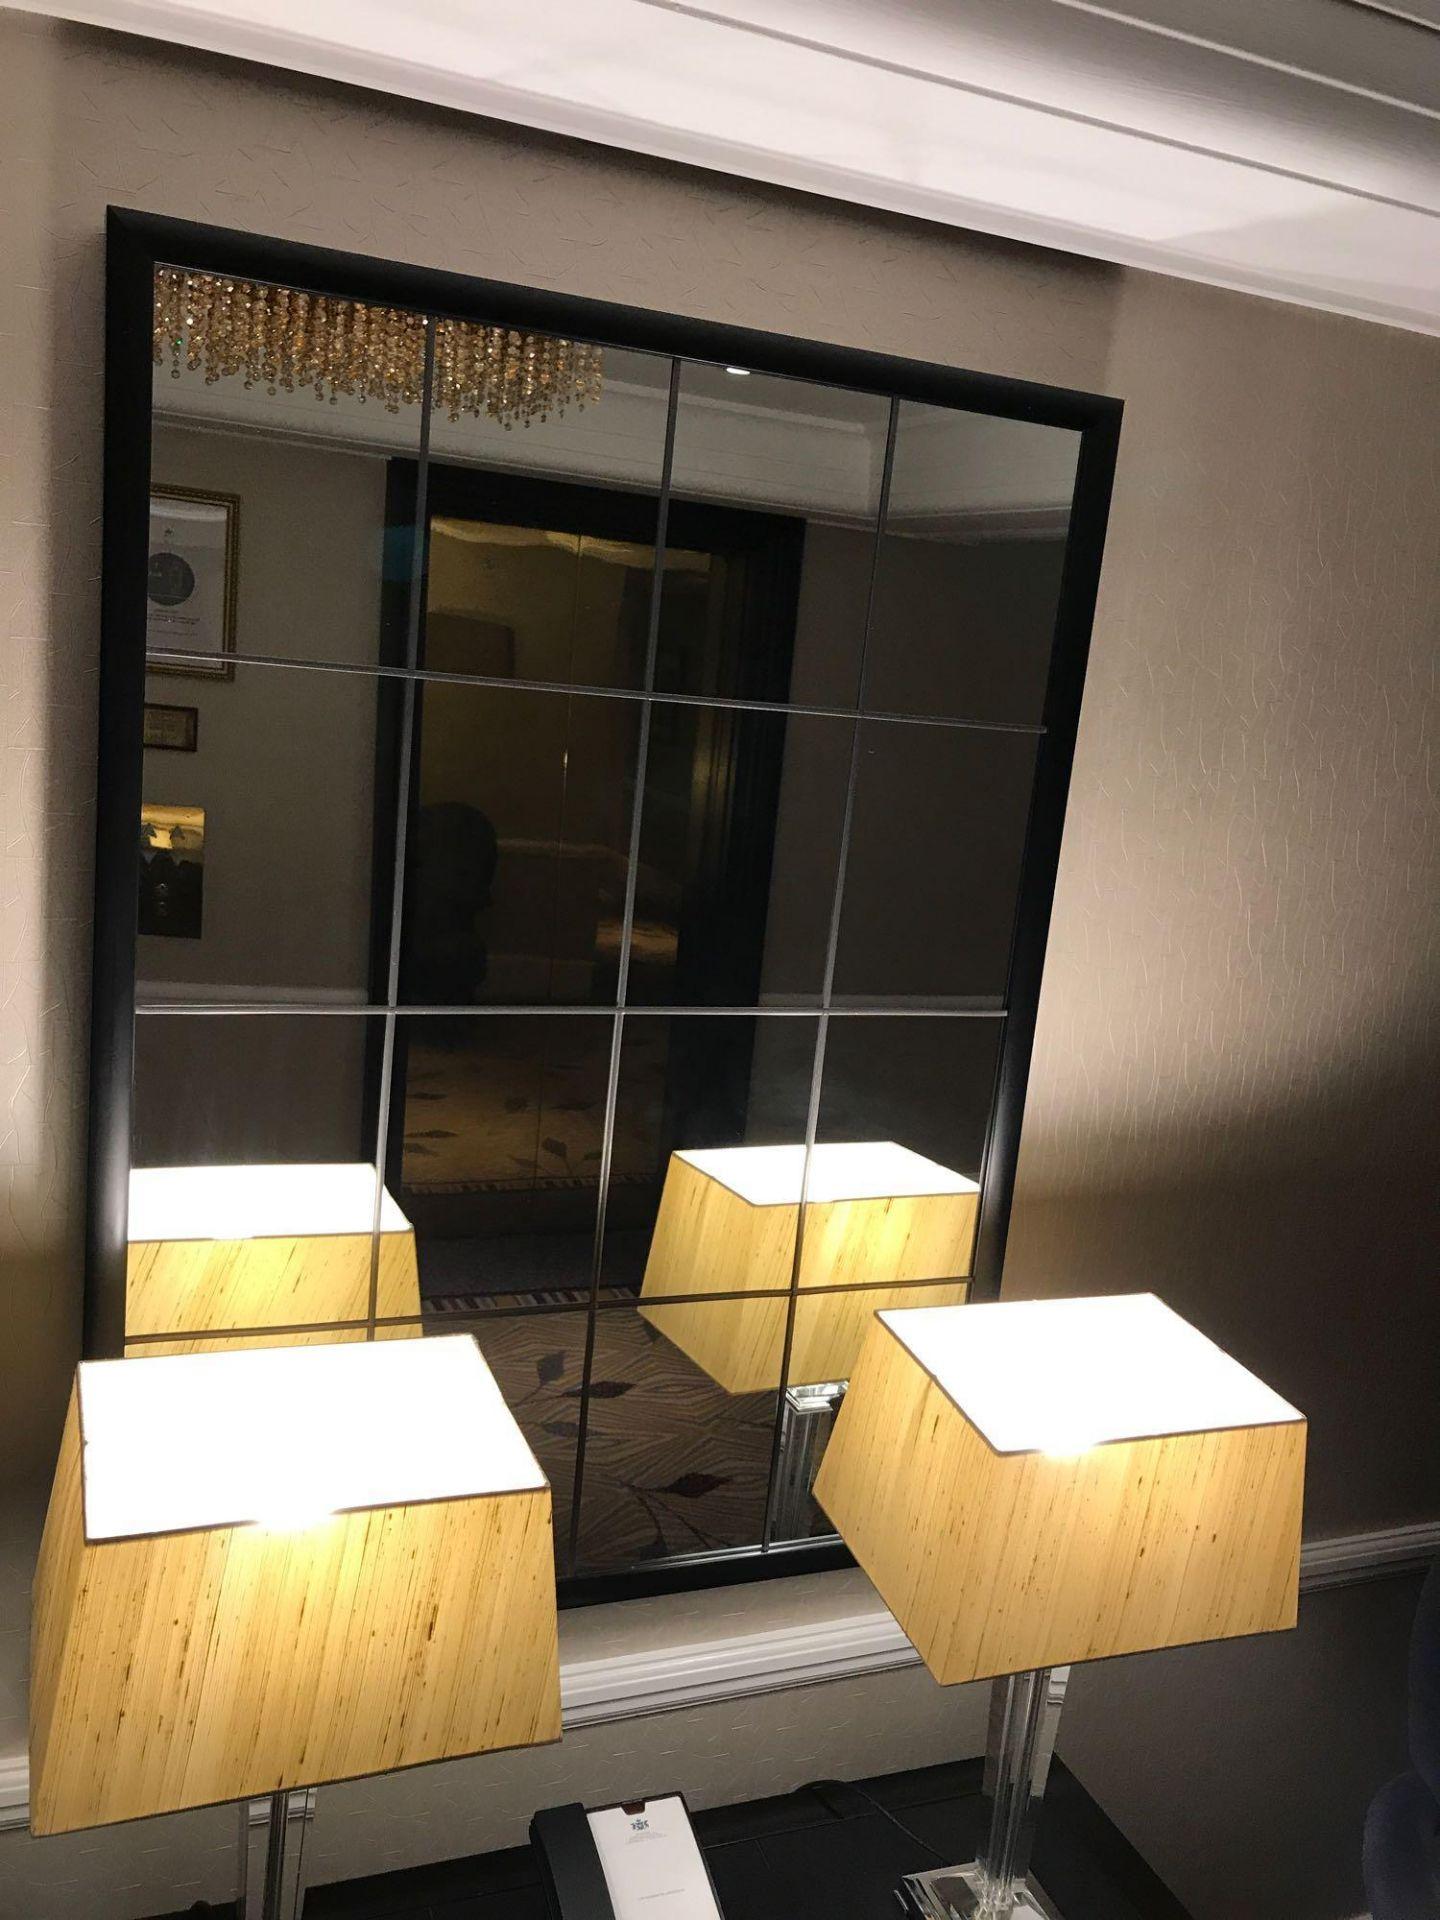 Porta Romana Riviera Mirror Bronzed With Mirror Glass 120x 90cm( Loc Hall Floor 2)